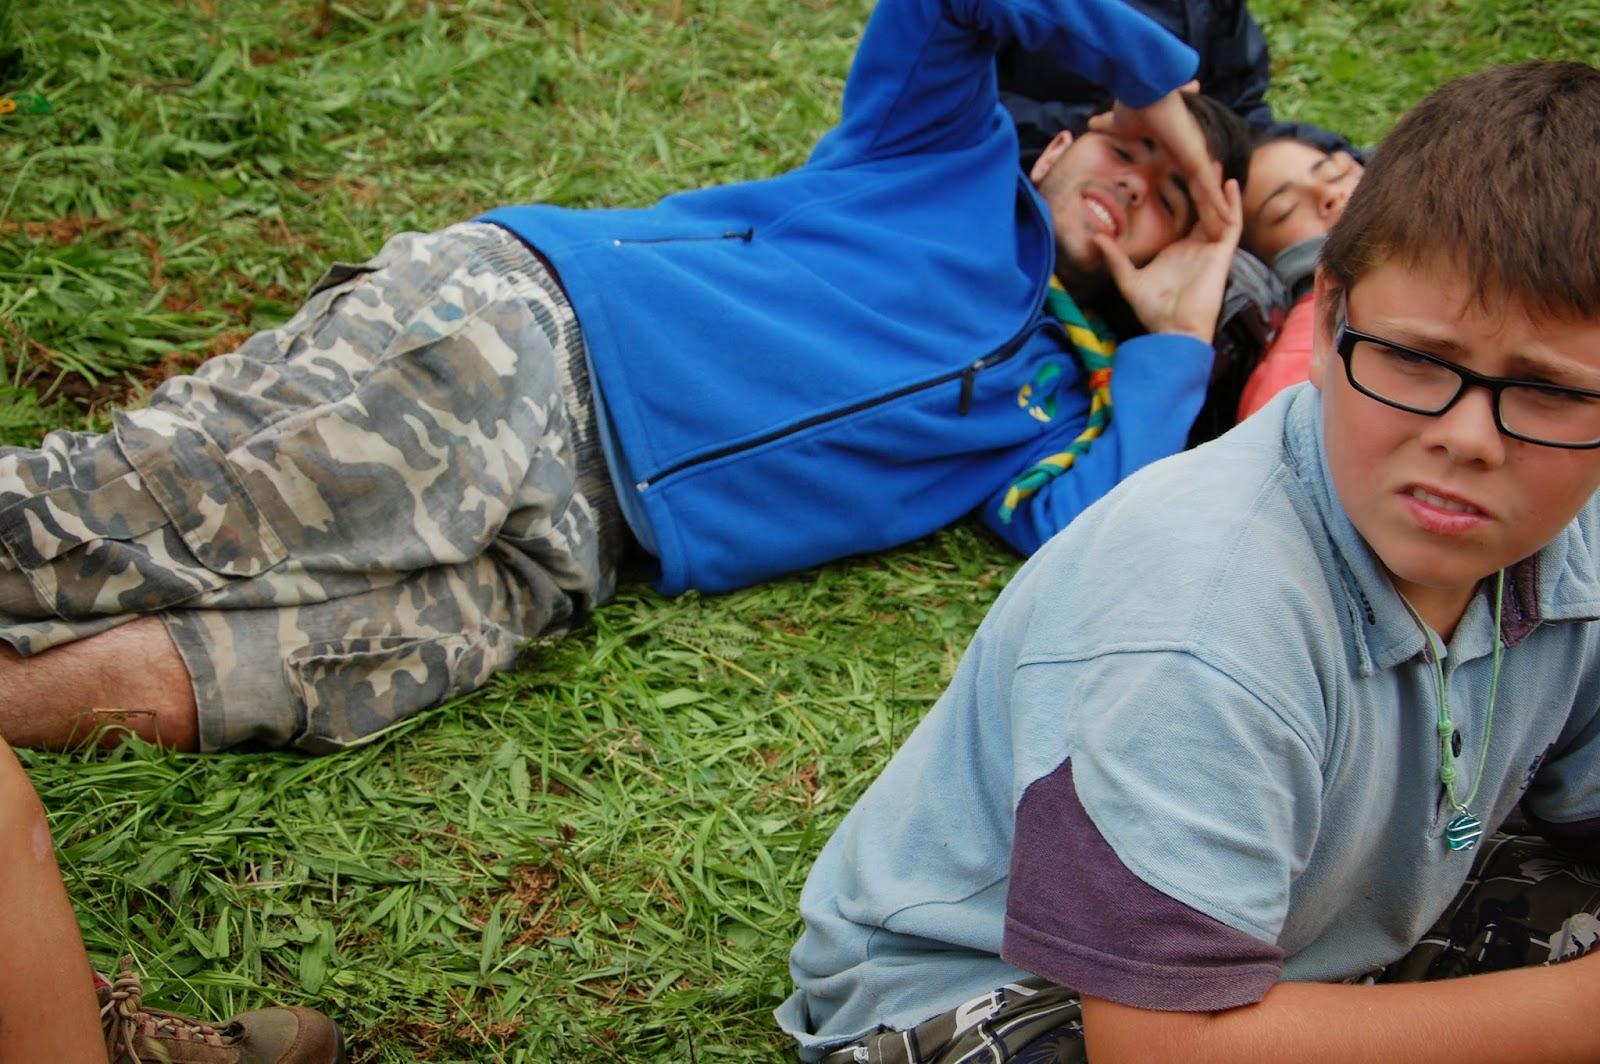 Campaments Estiu RolandKing 2011 - DSC_0125%2B2.JPG